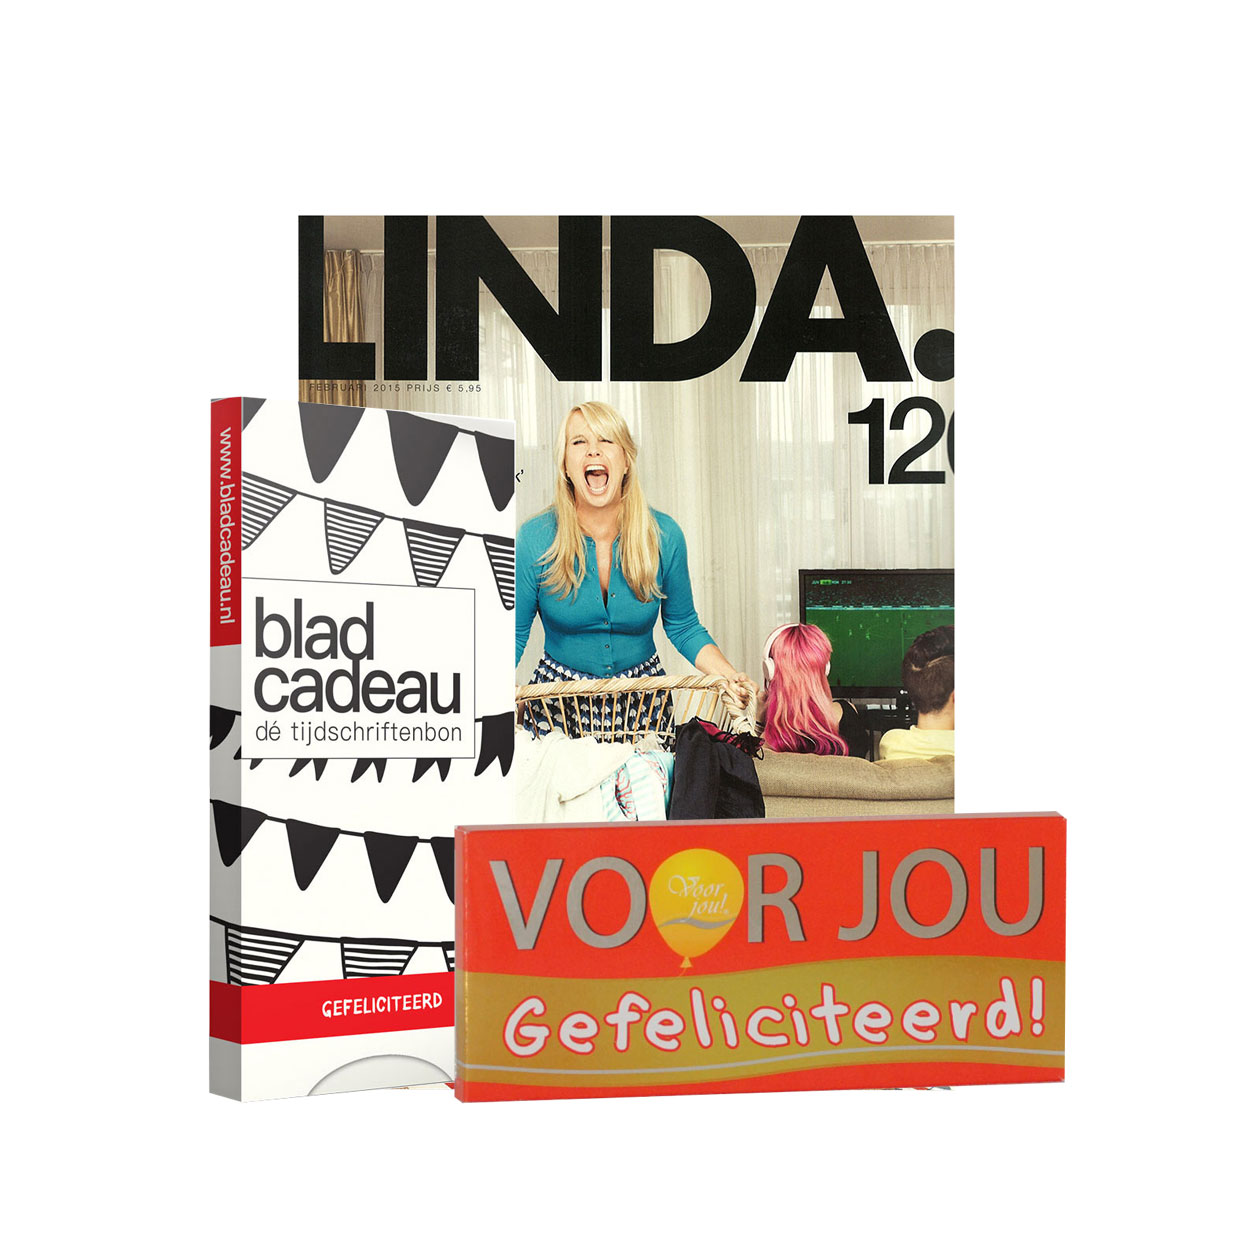 Bladcadeau 15 Euro Linda